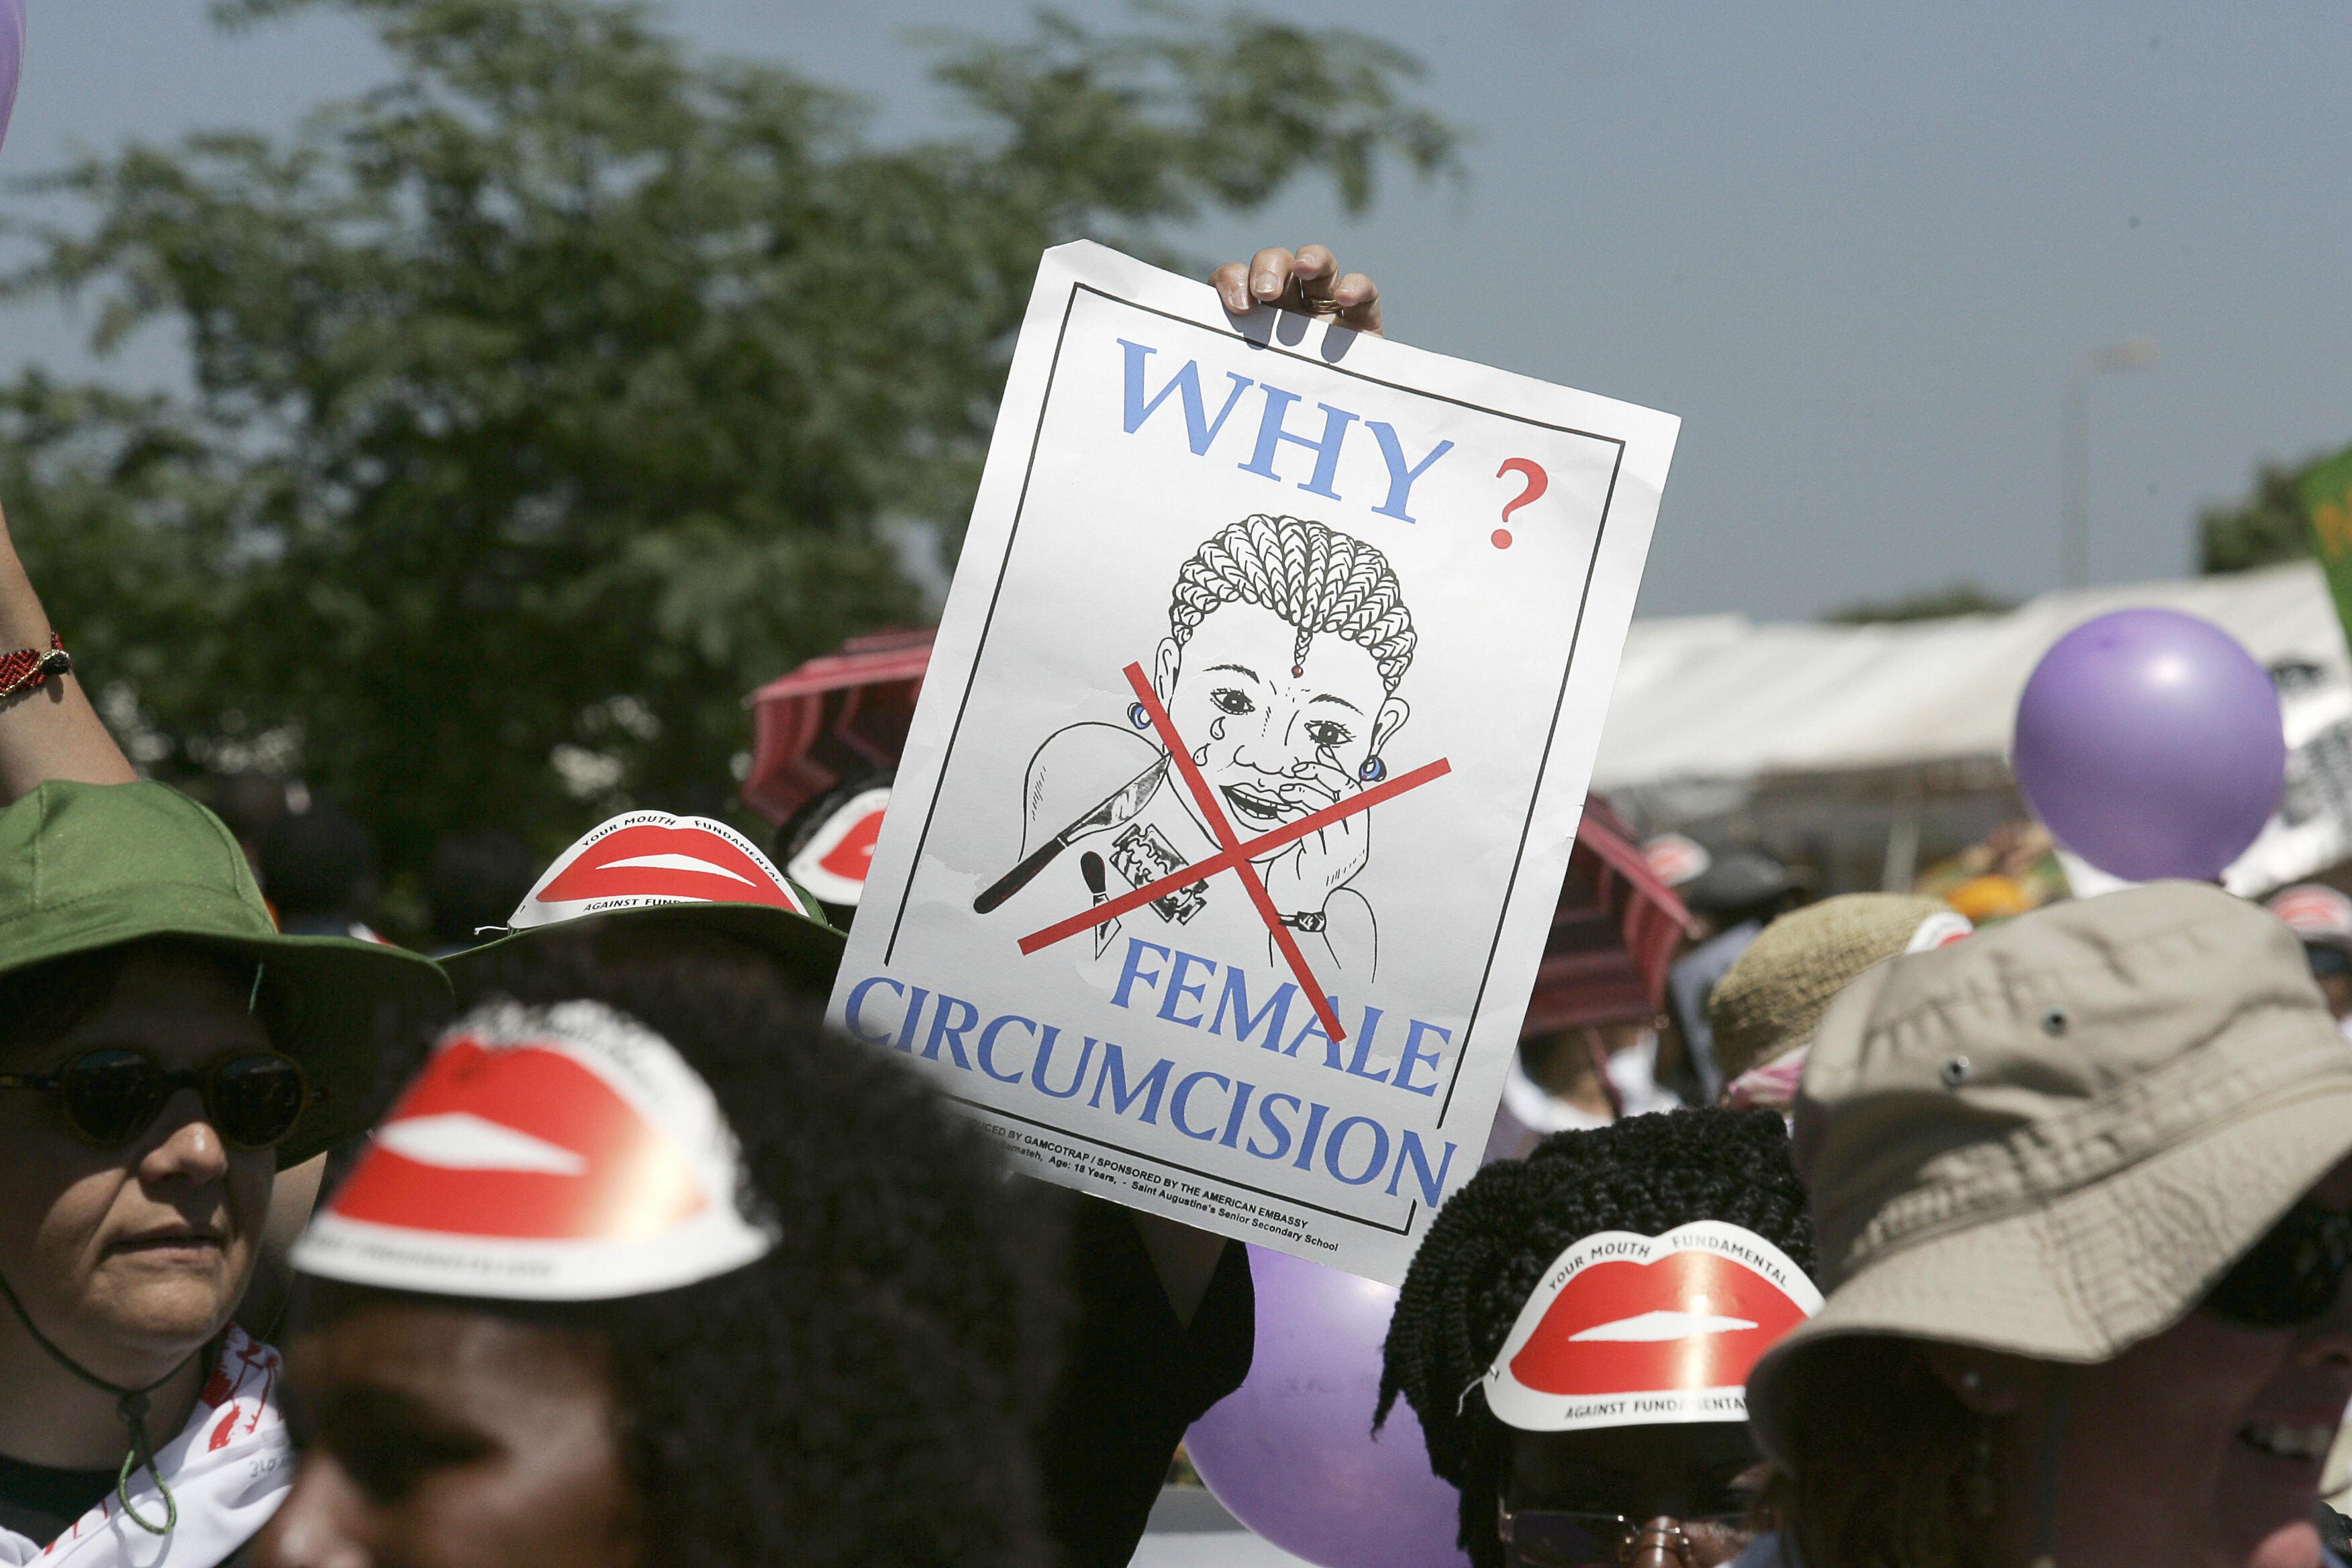 Nairobi, KENYA: Members of African Gay and Lesbian communities demonstrate against female genital mutilation. (Photo credit should read MARCO LONGARI/AFP/Getty Images)